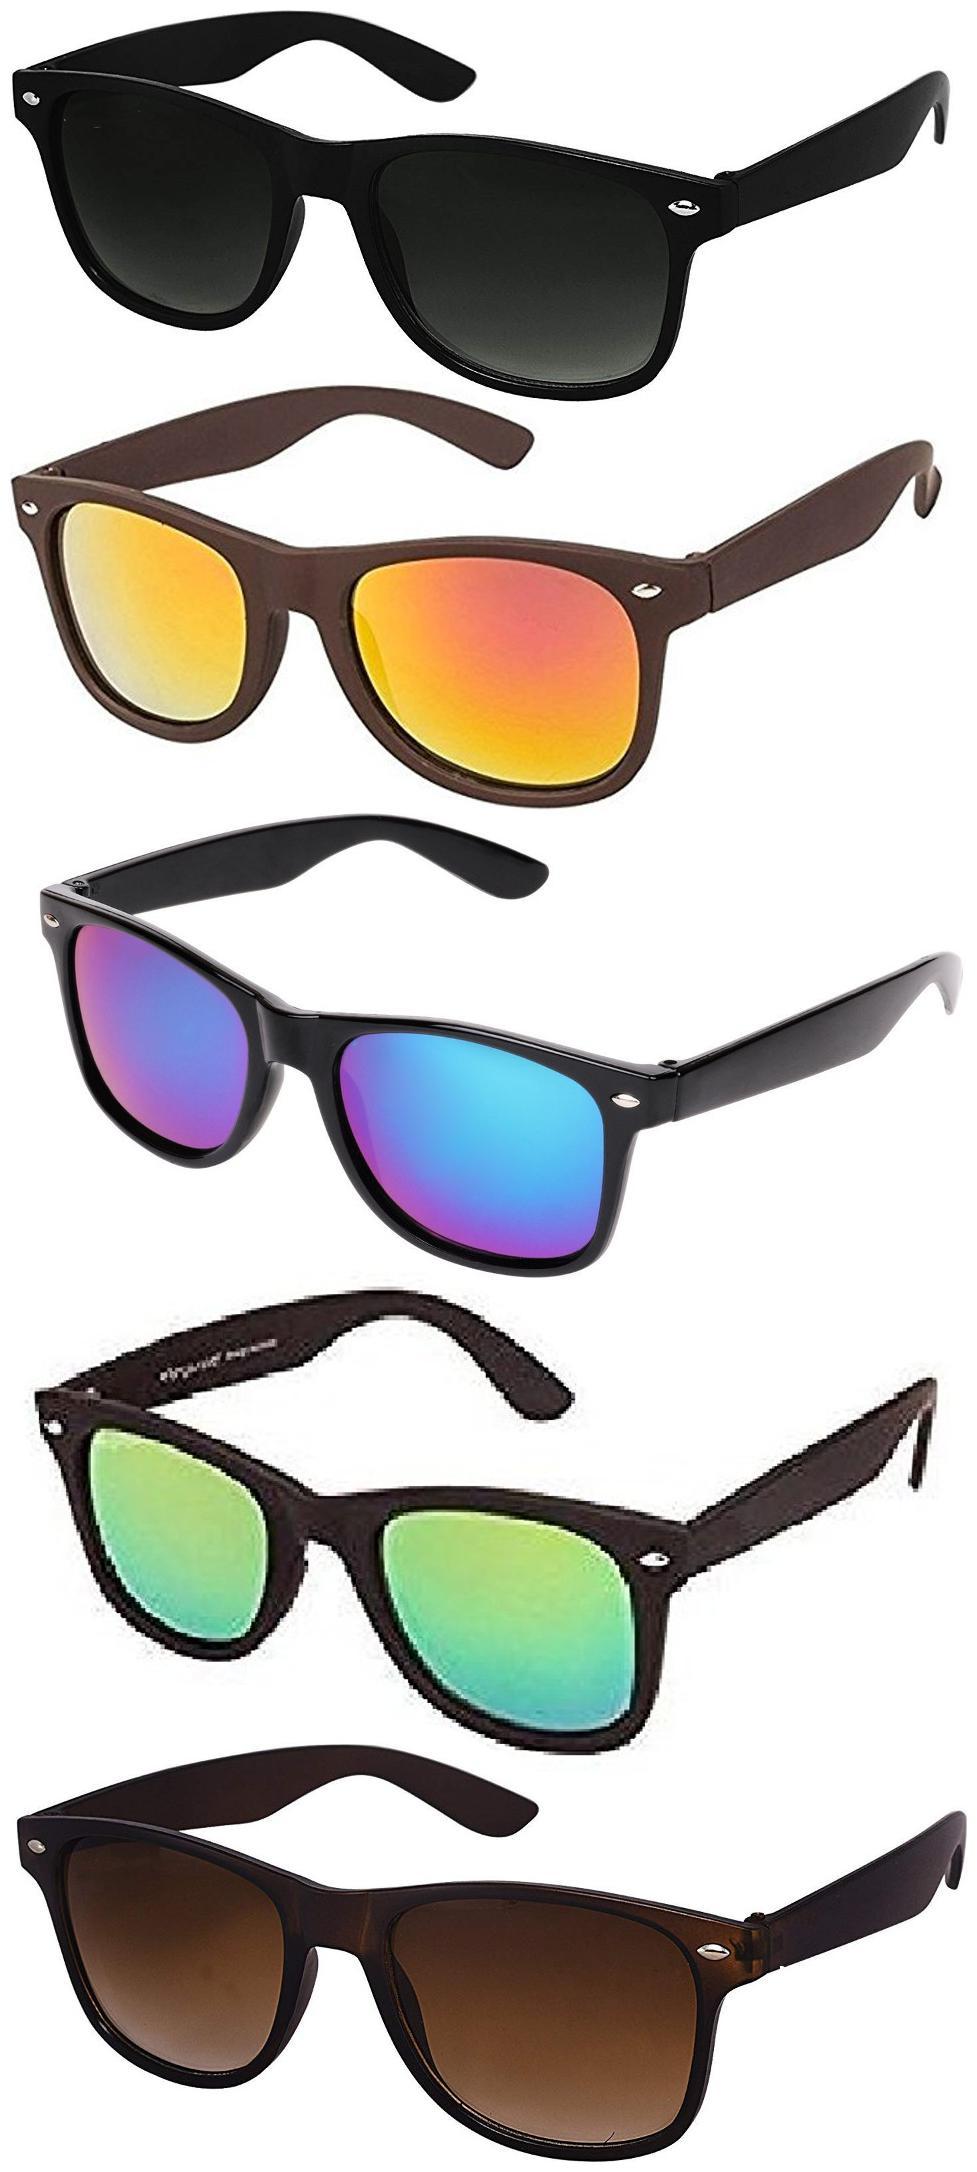 New Fashion Designer DG Eyewear Men Women Wood Like Cat Eye Sunglasses 423 Blue